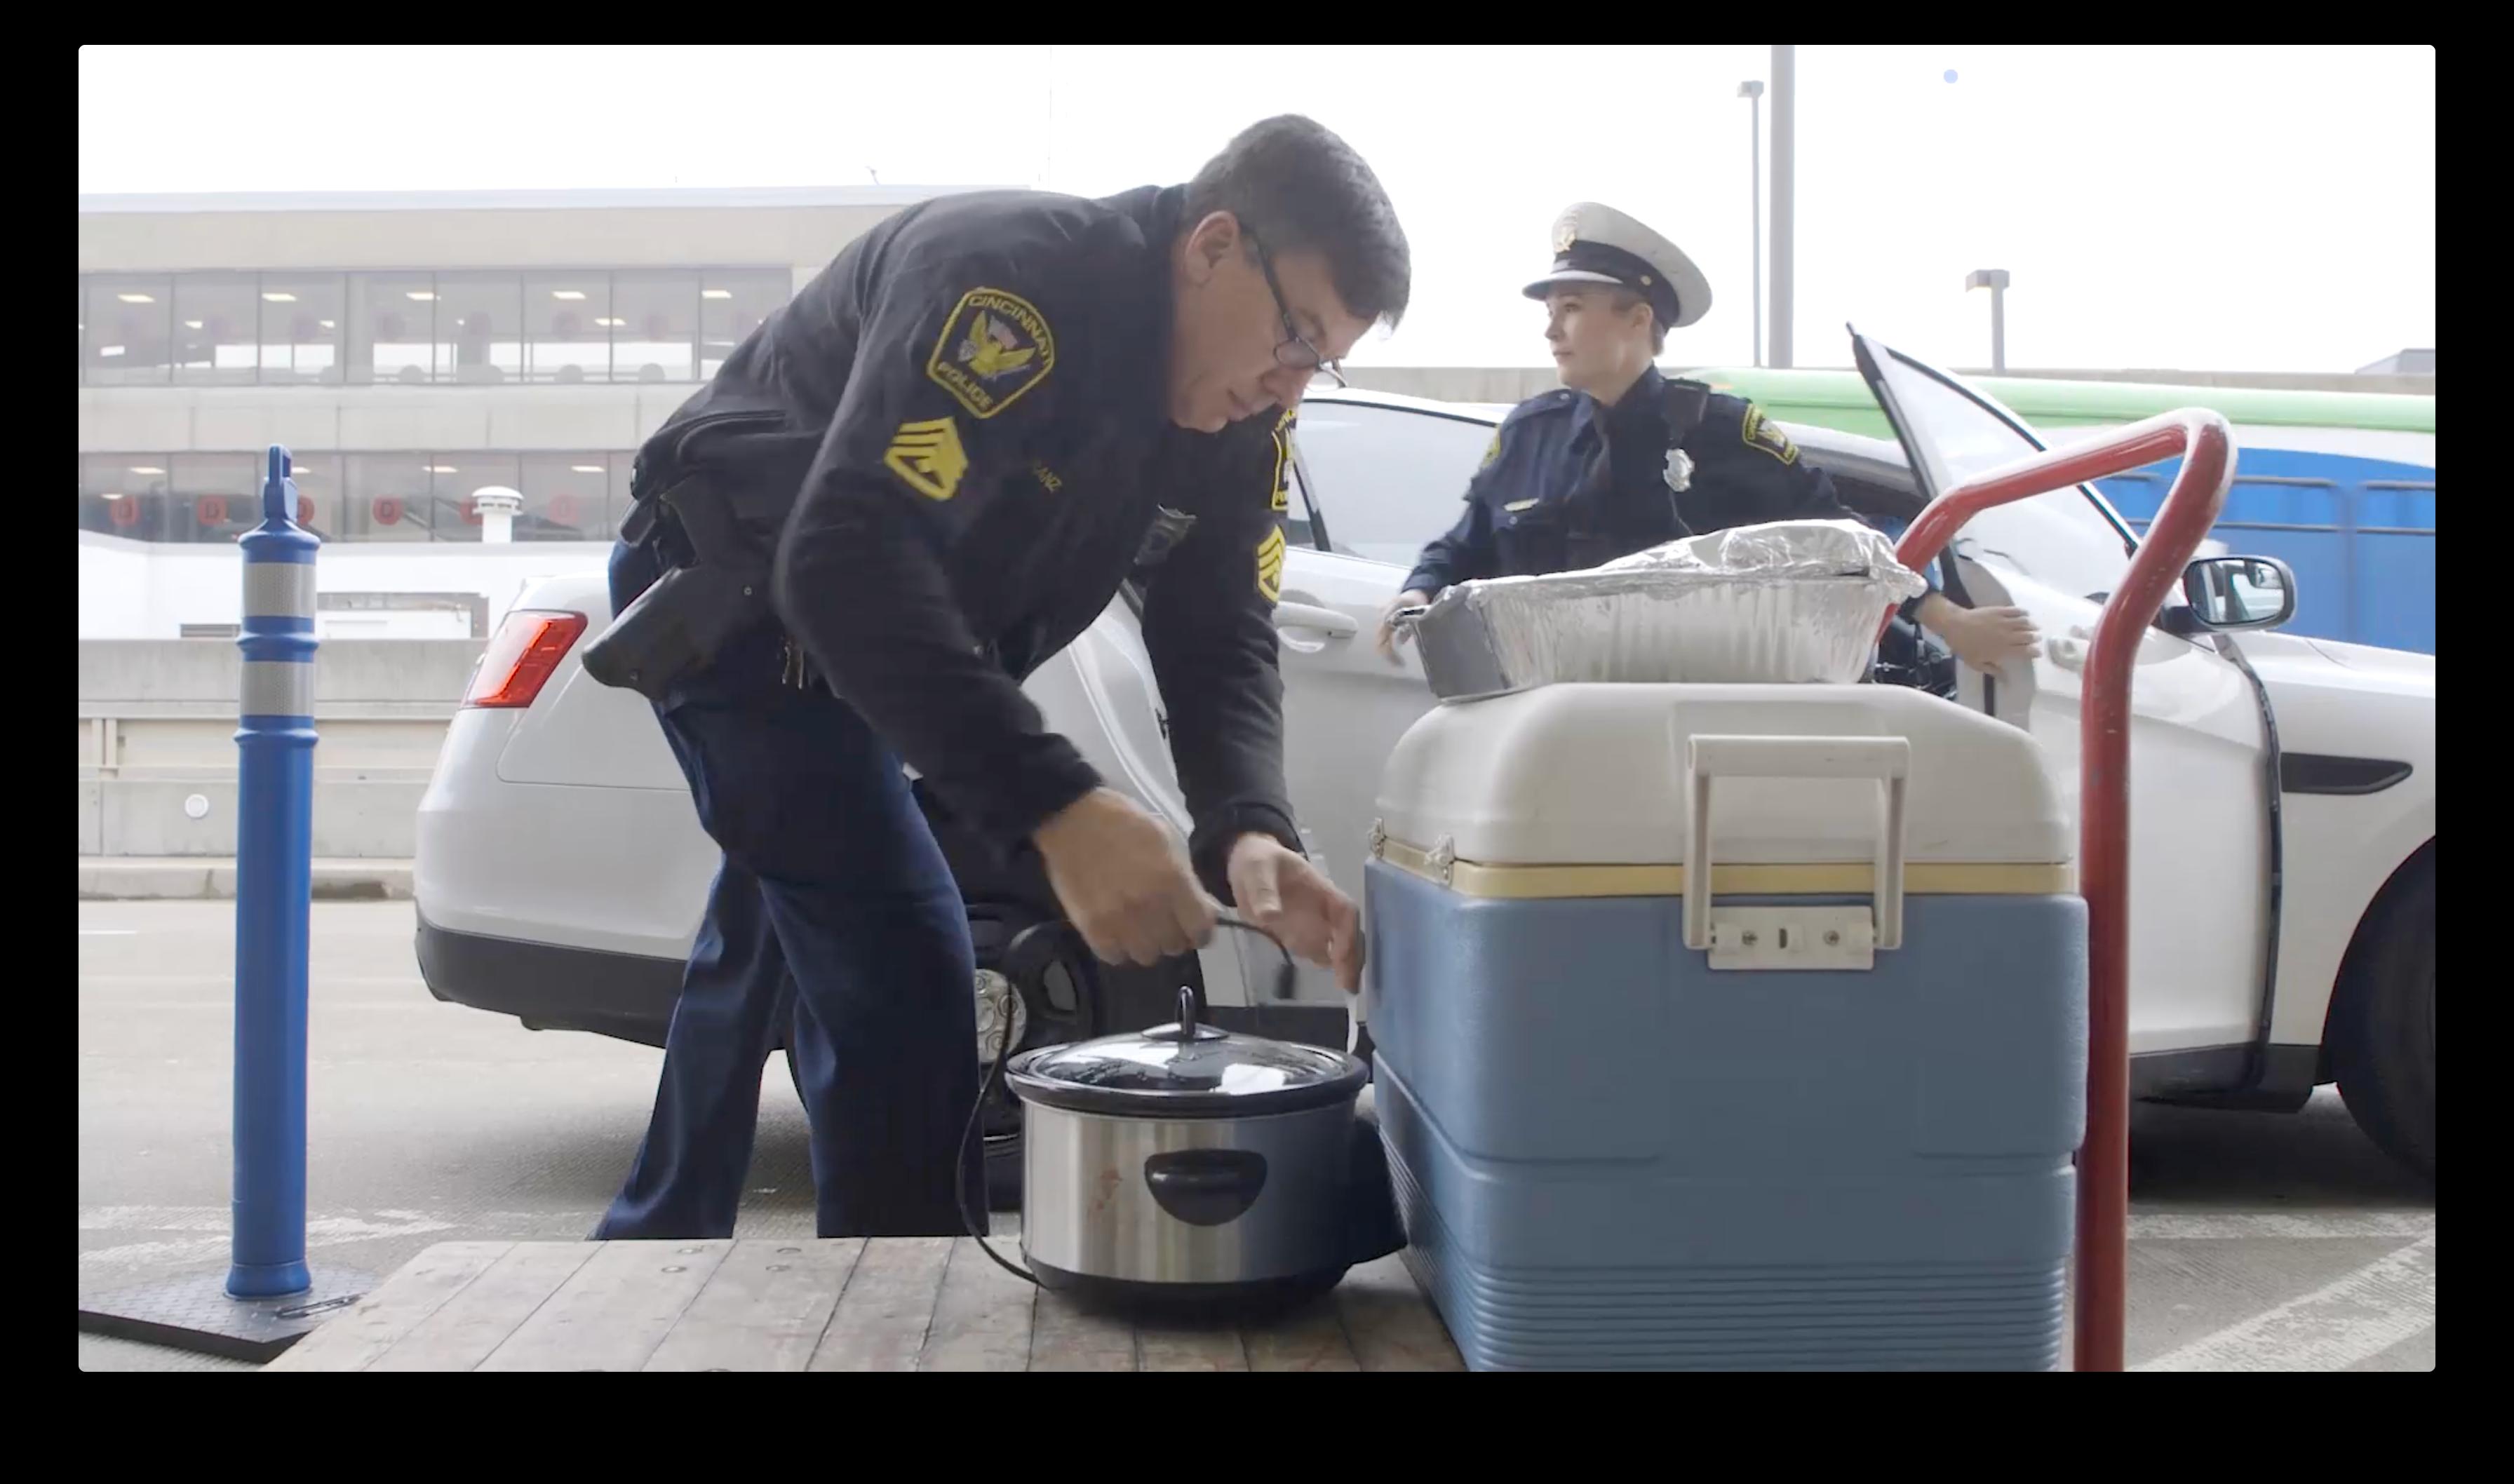 Cincinnati police bring food for TSA agents